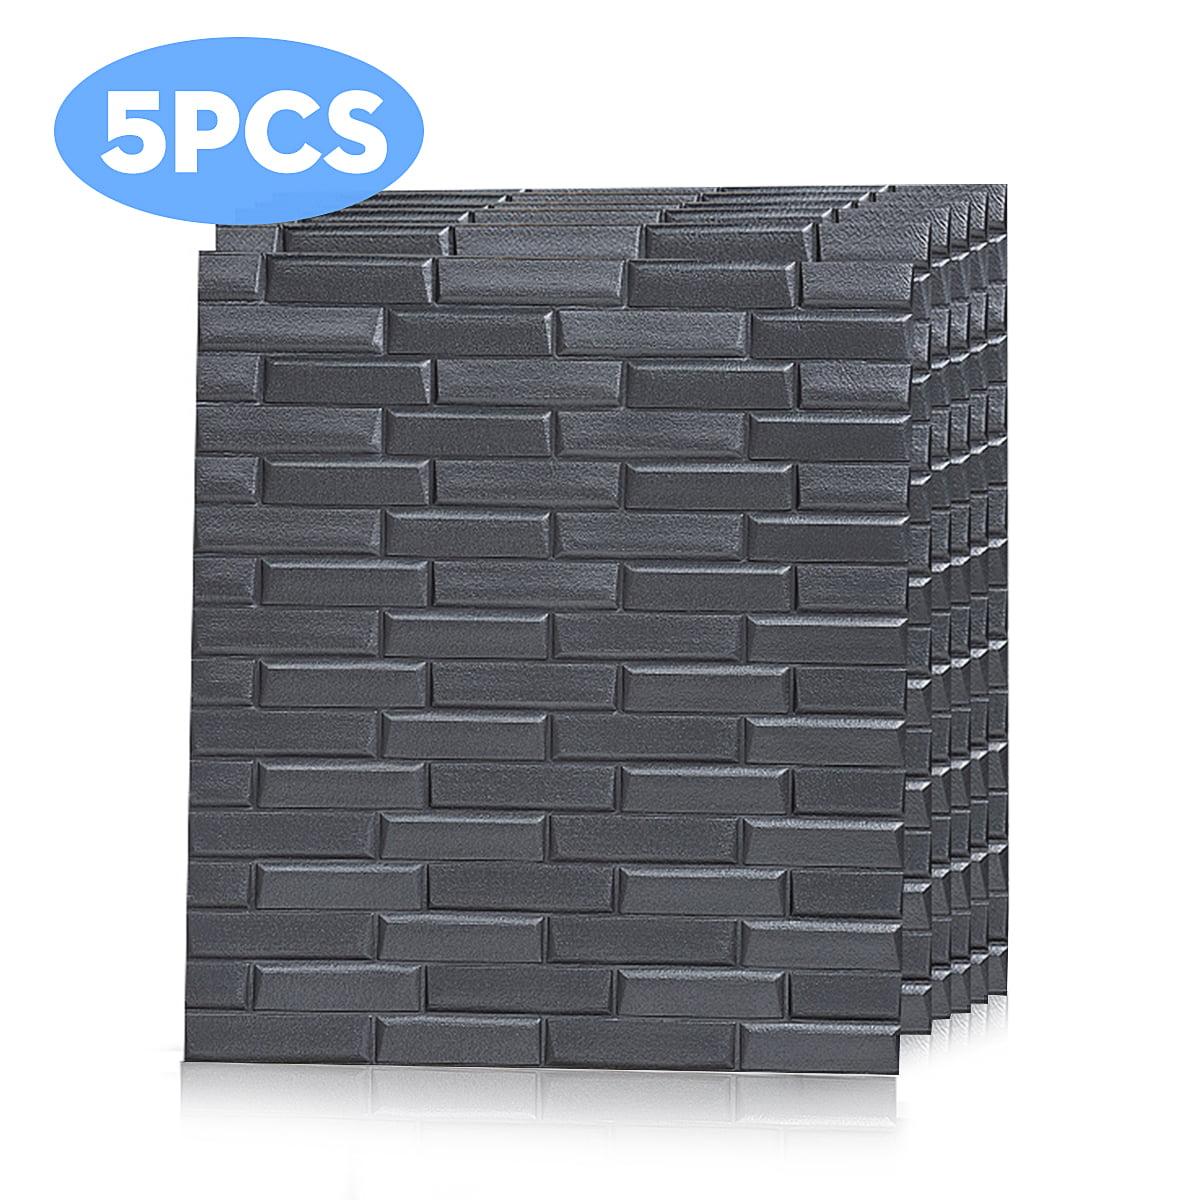 3D Tile Brick Wall Stickers Self-adhesive Waterproof Foam Panel Sticker Decors